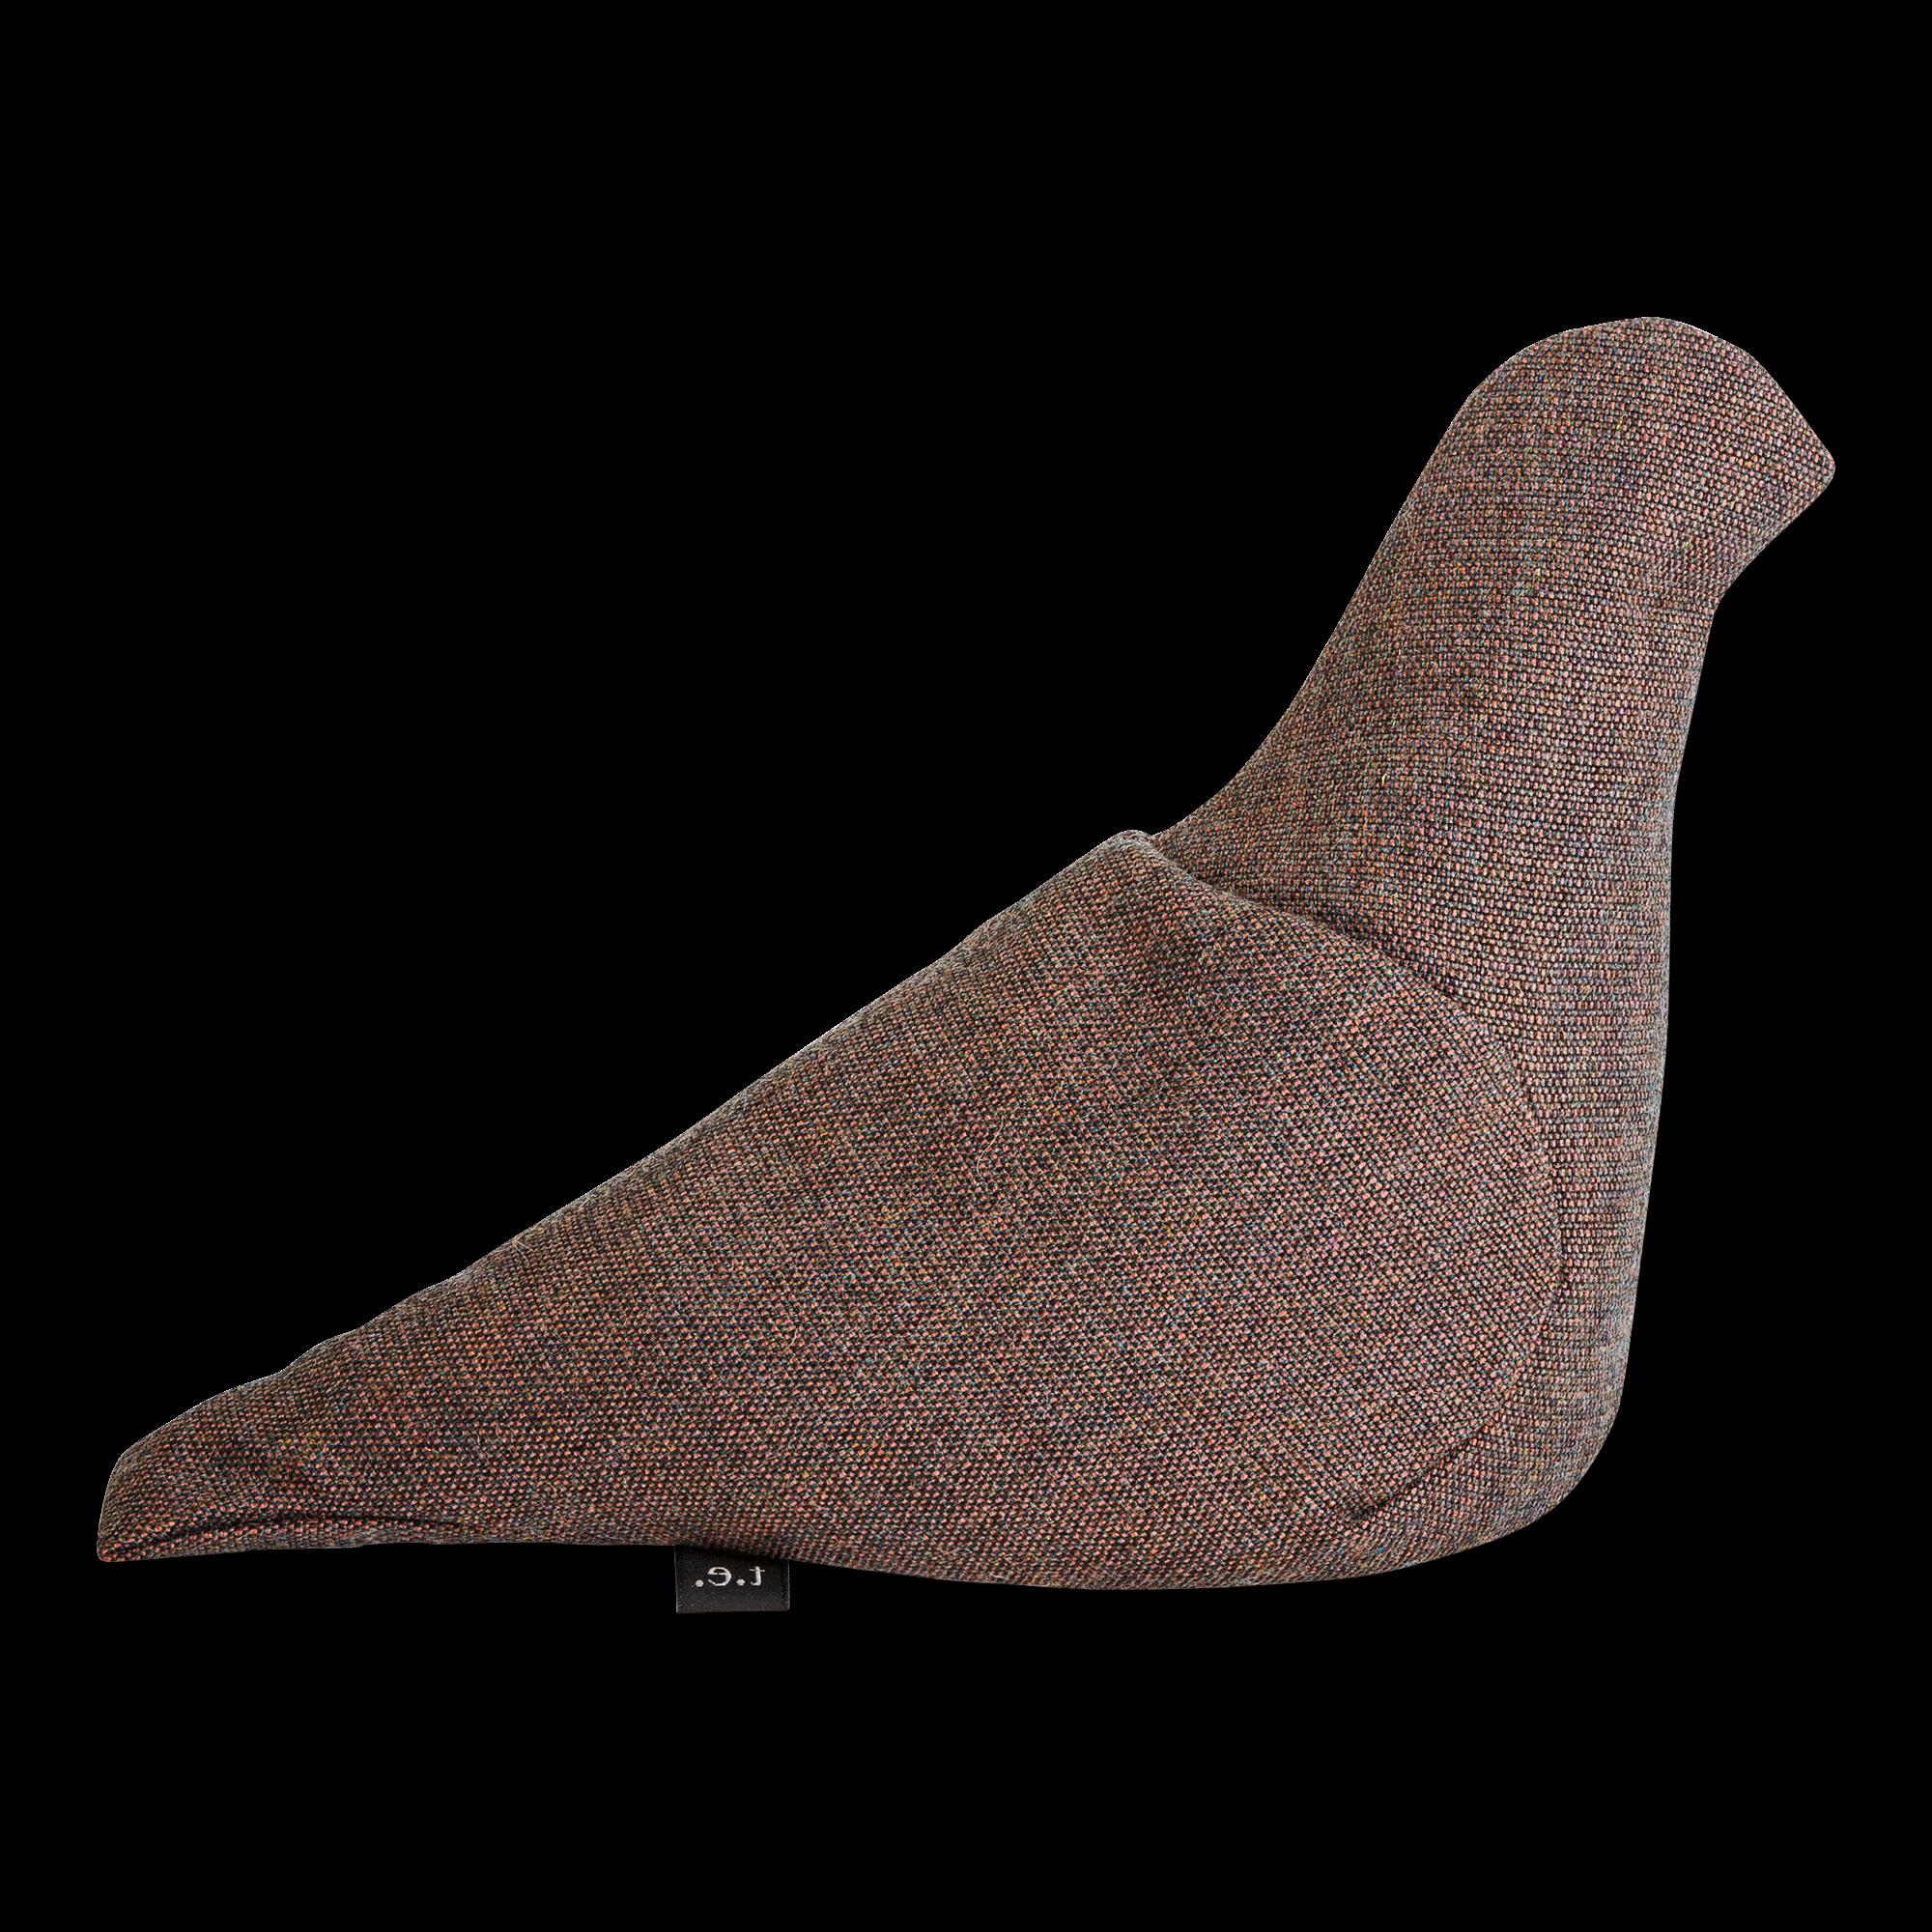 pigeon-service-25-1